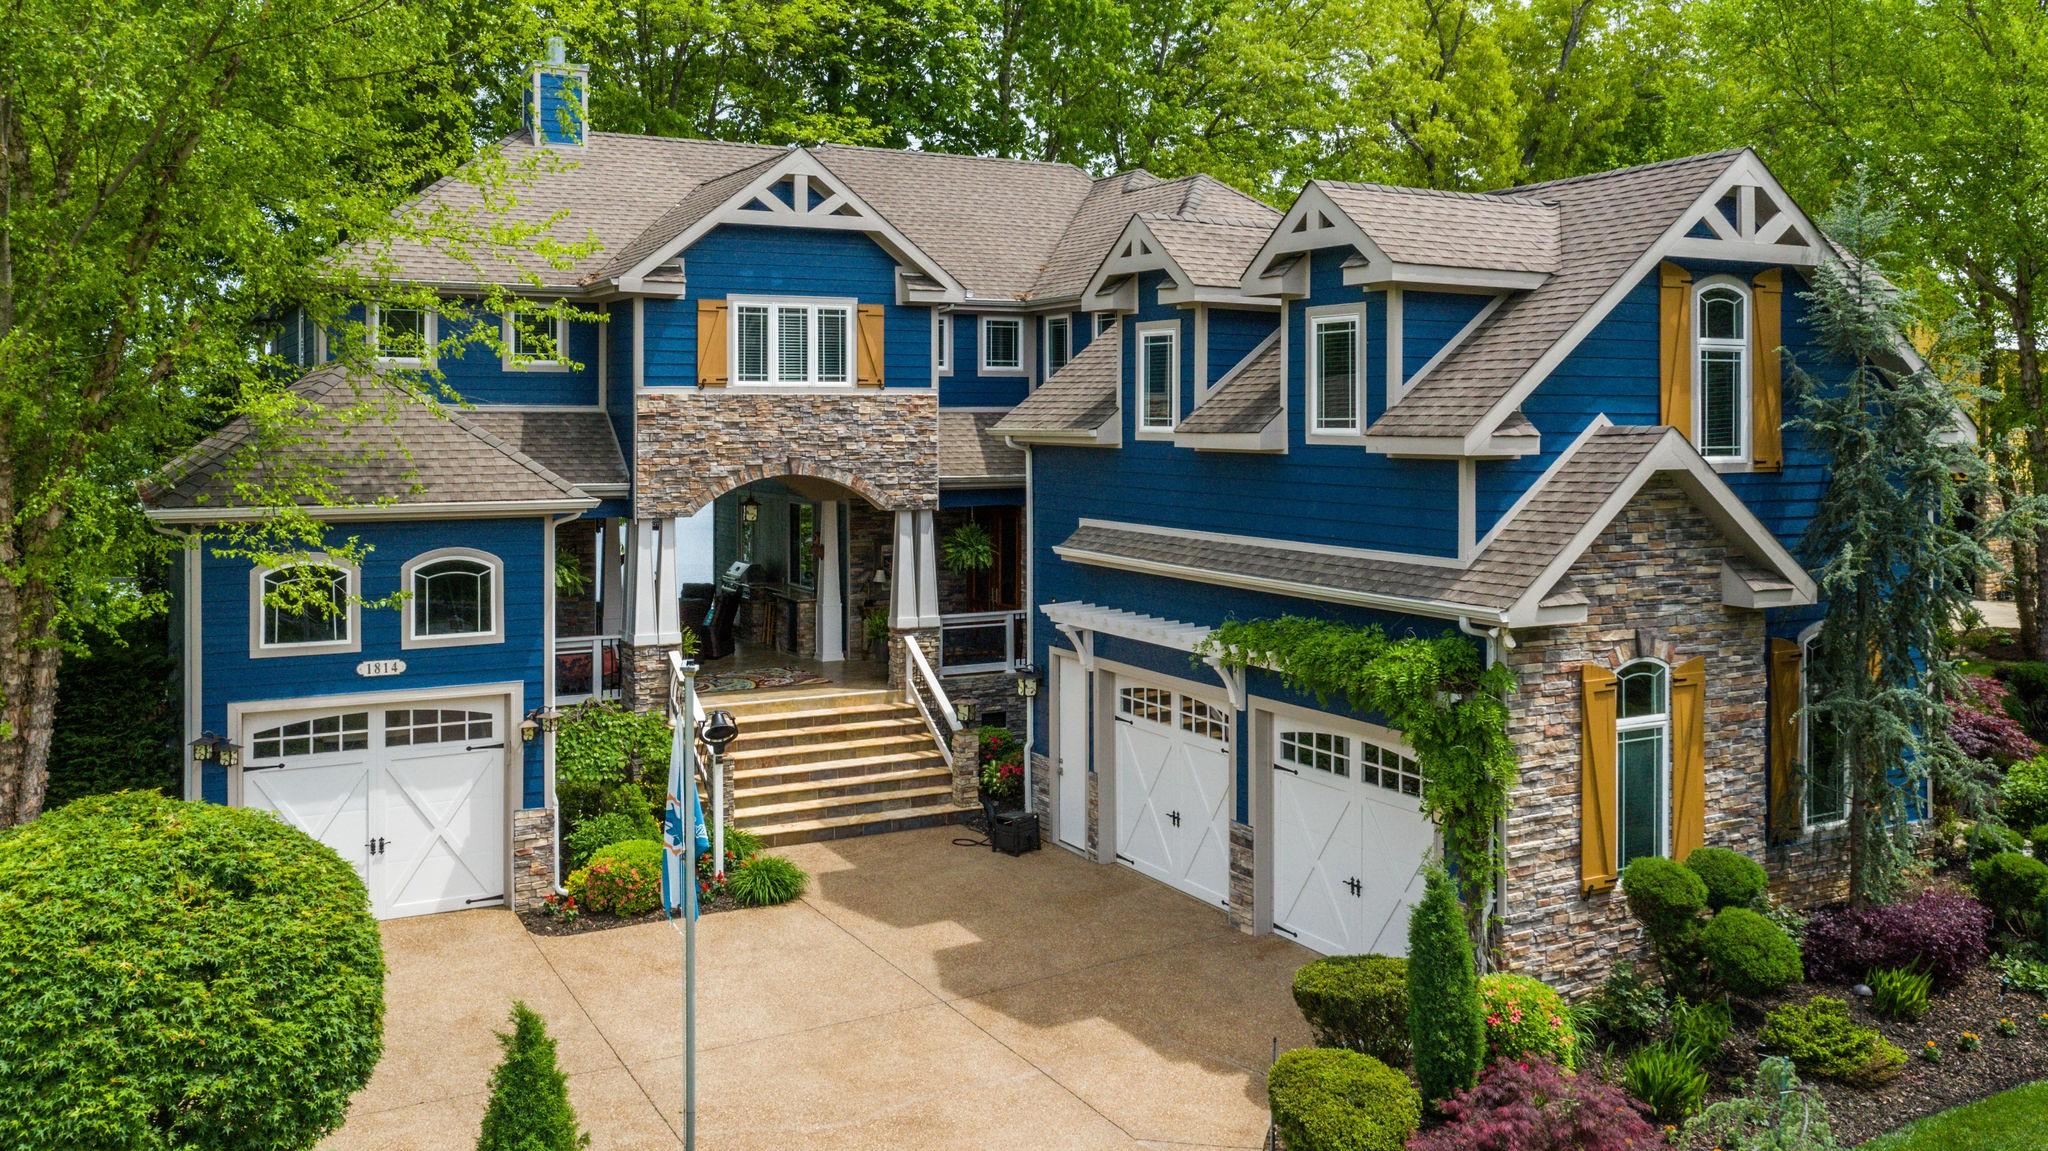 1814 Awalt Dr, Winchester, TN 37398 - Winchester, TN real estate listing